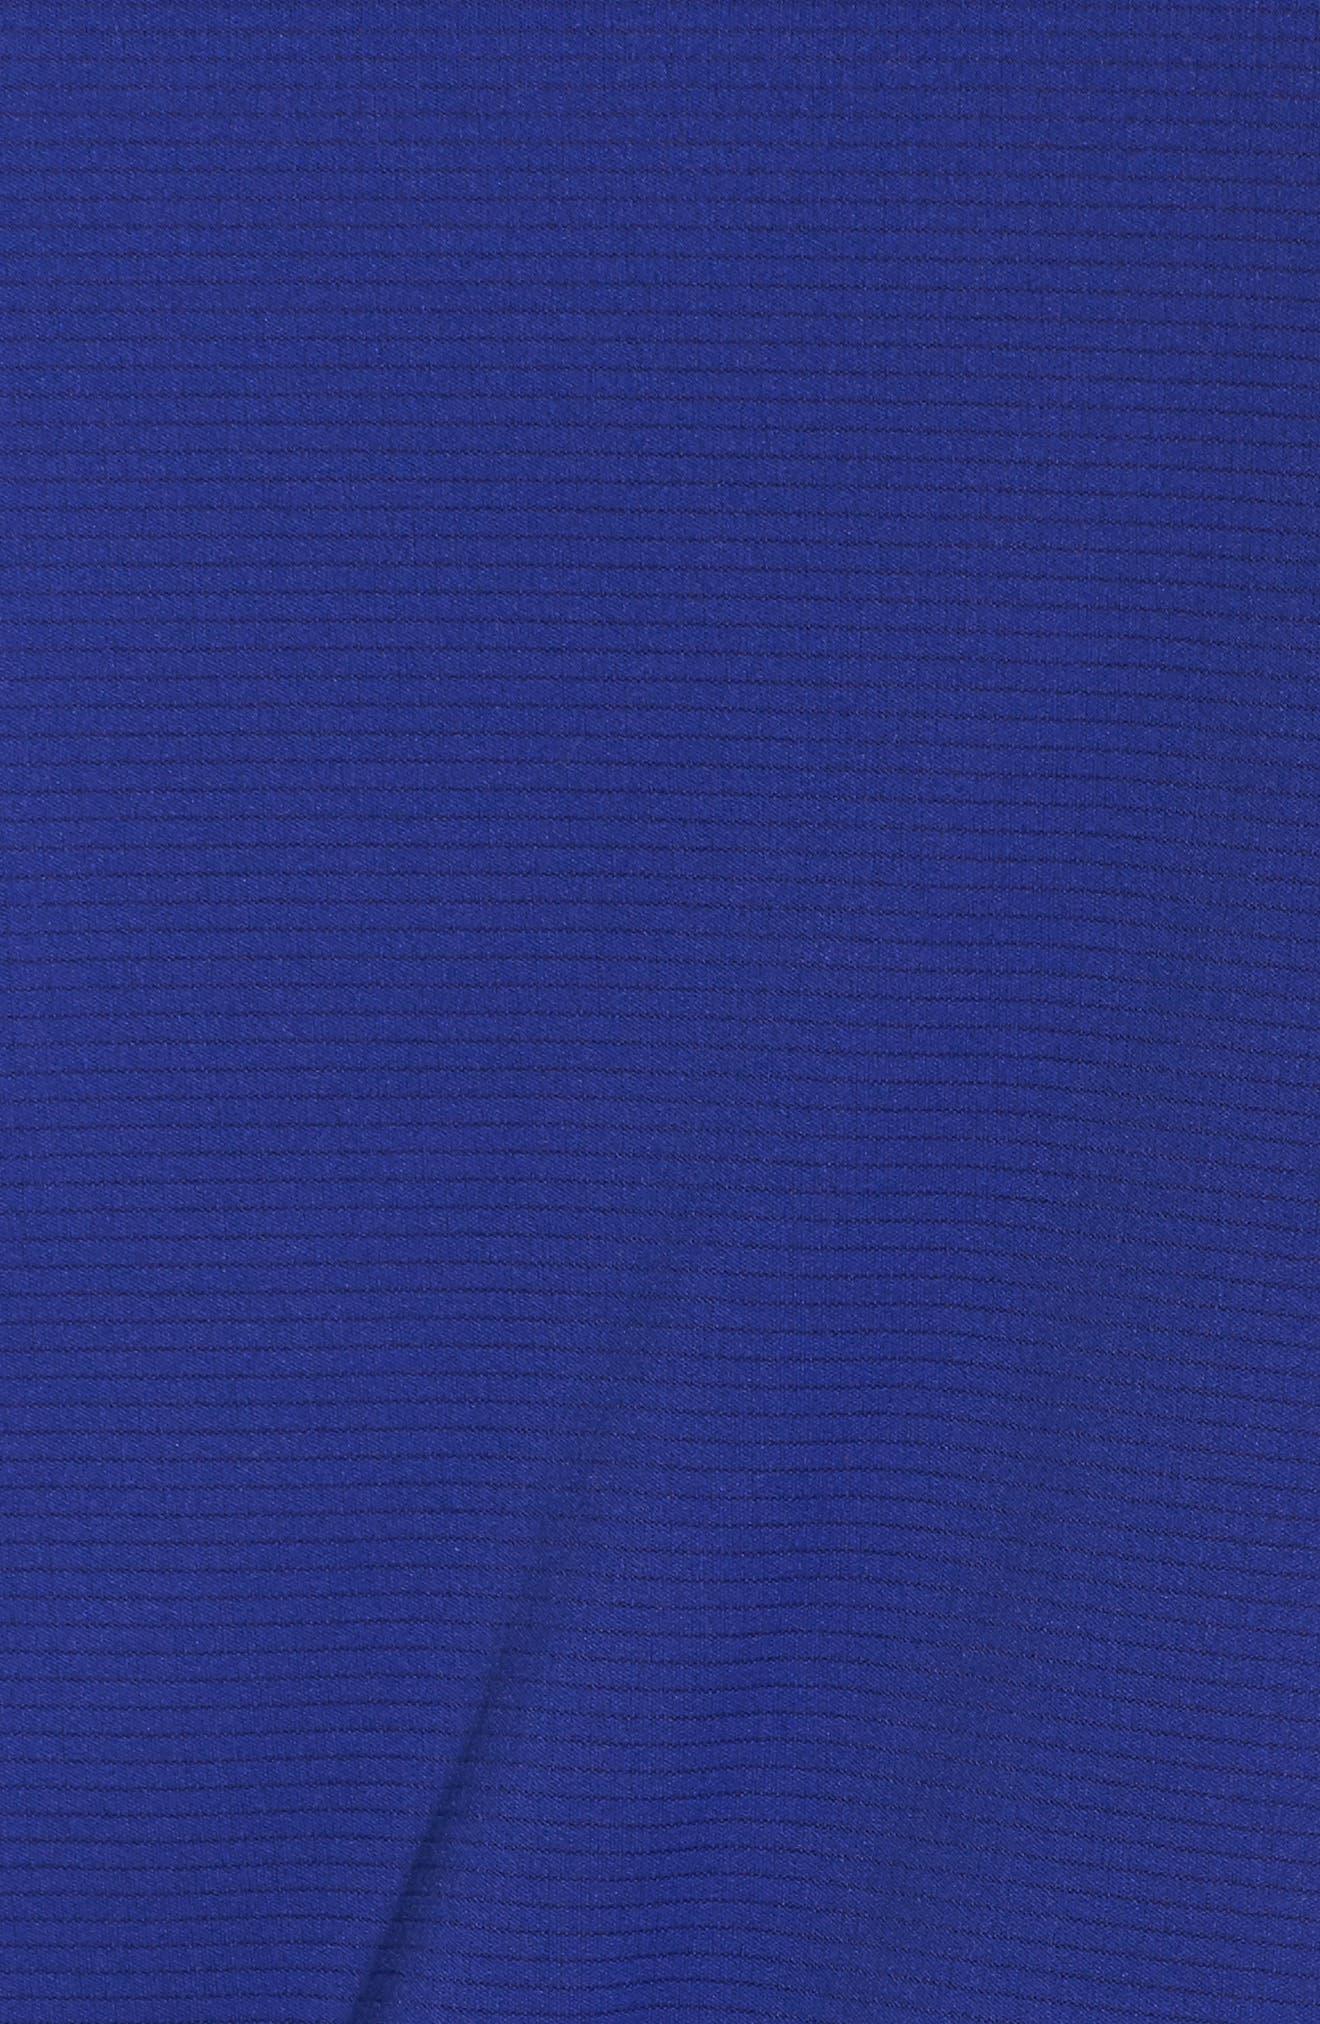 Lightweight Capilene<sup>®</sup> Long-Sleeve Tee,                             Alternate thumbnail 10, color,